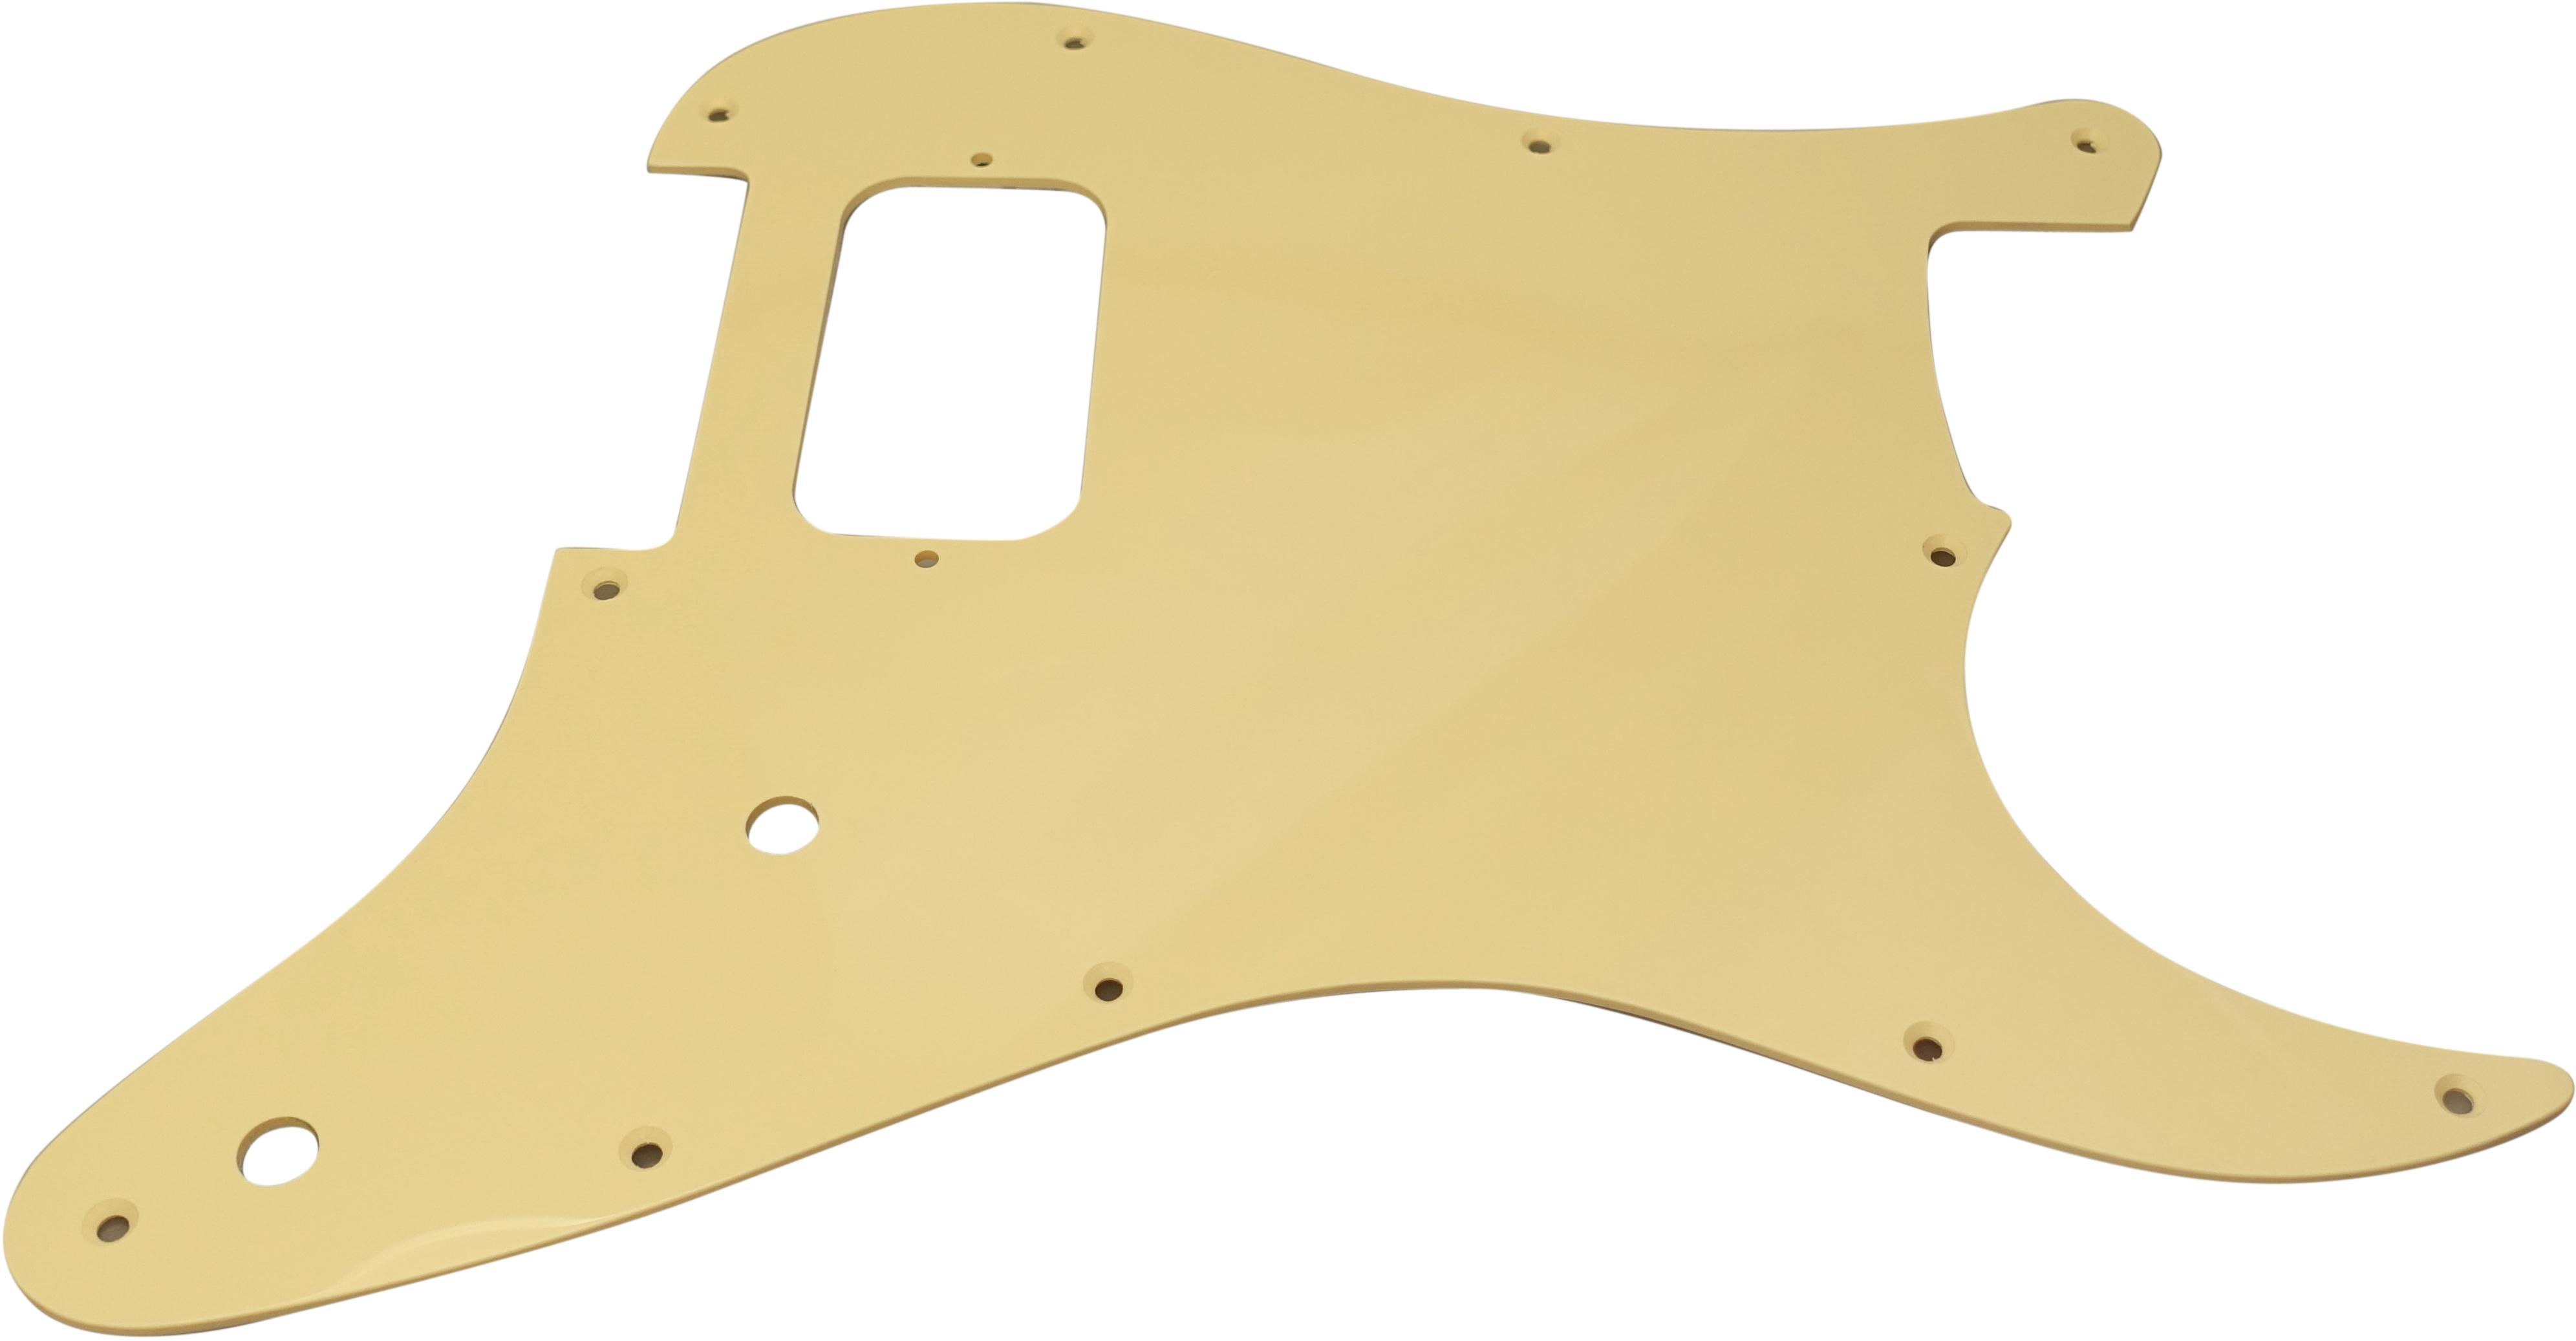 Toronzo Pickguard ST-H-2P-1PLY-Cream